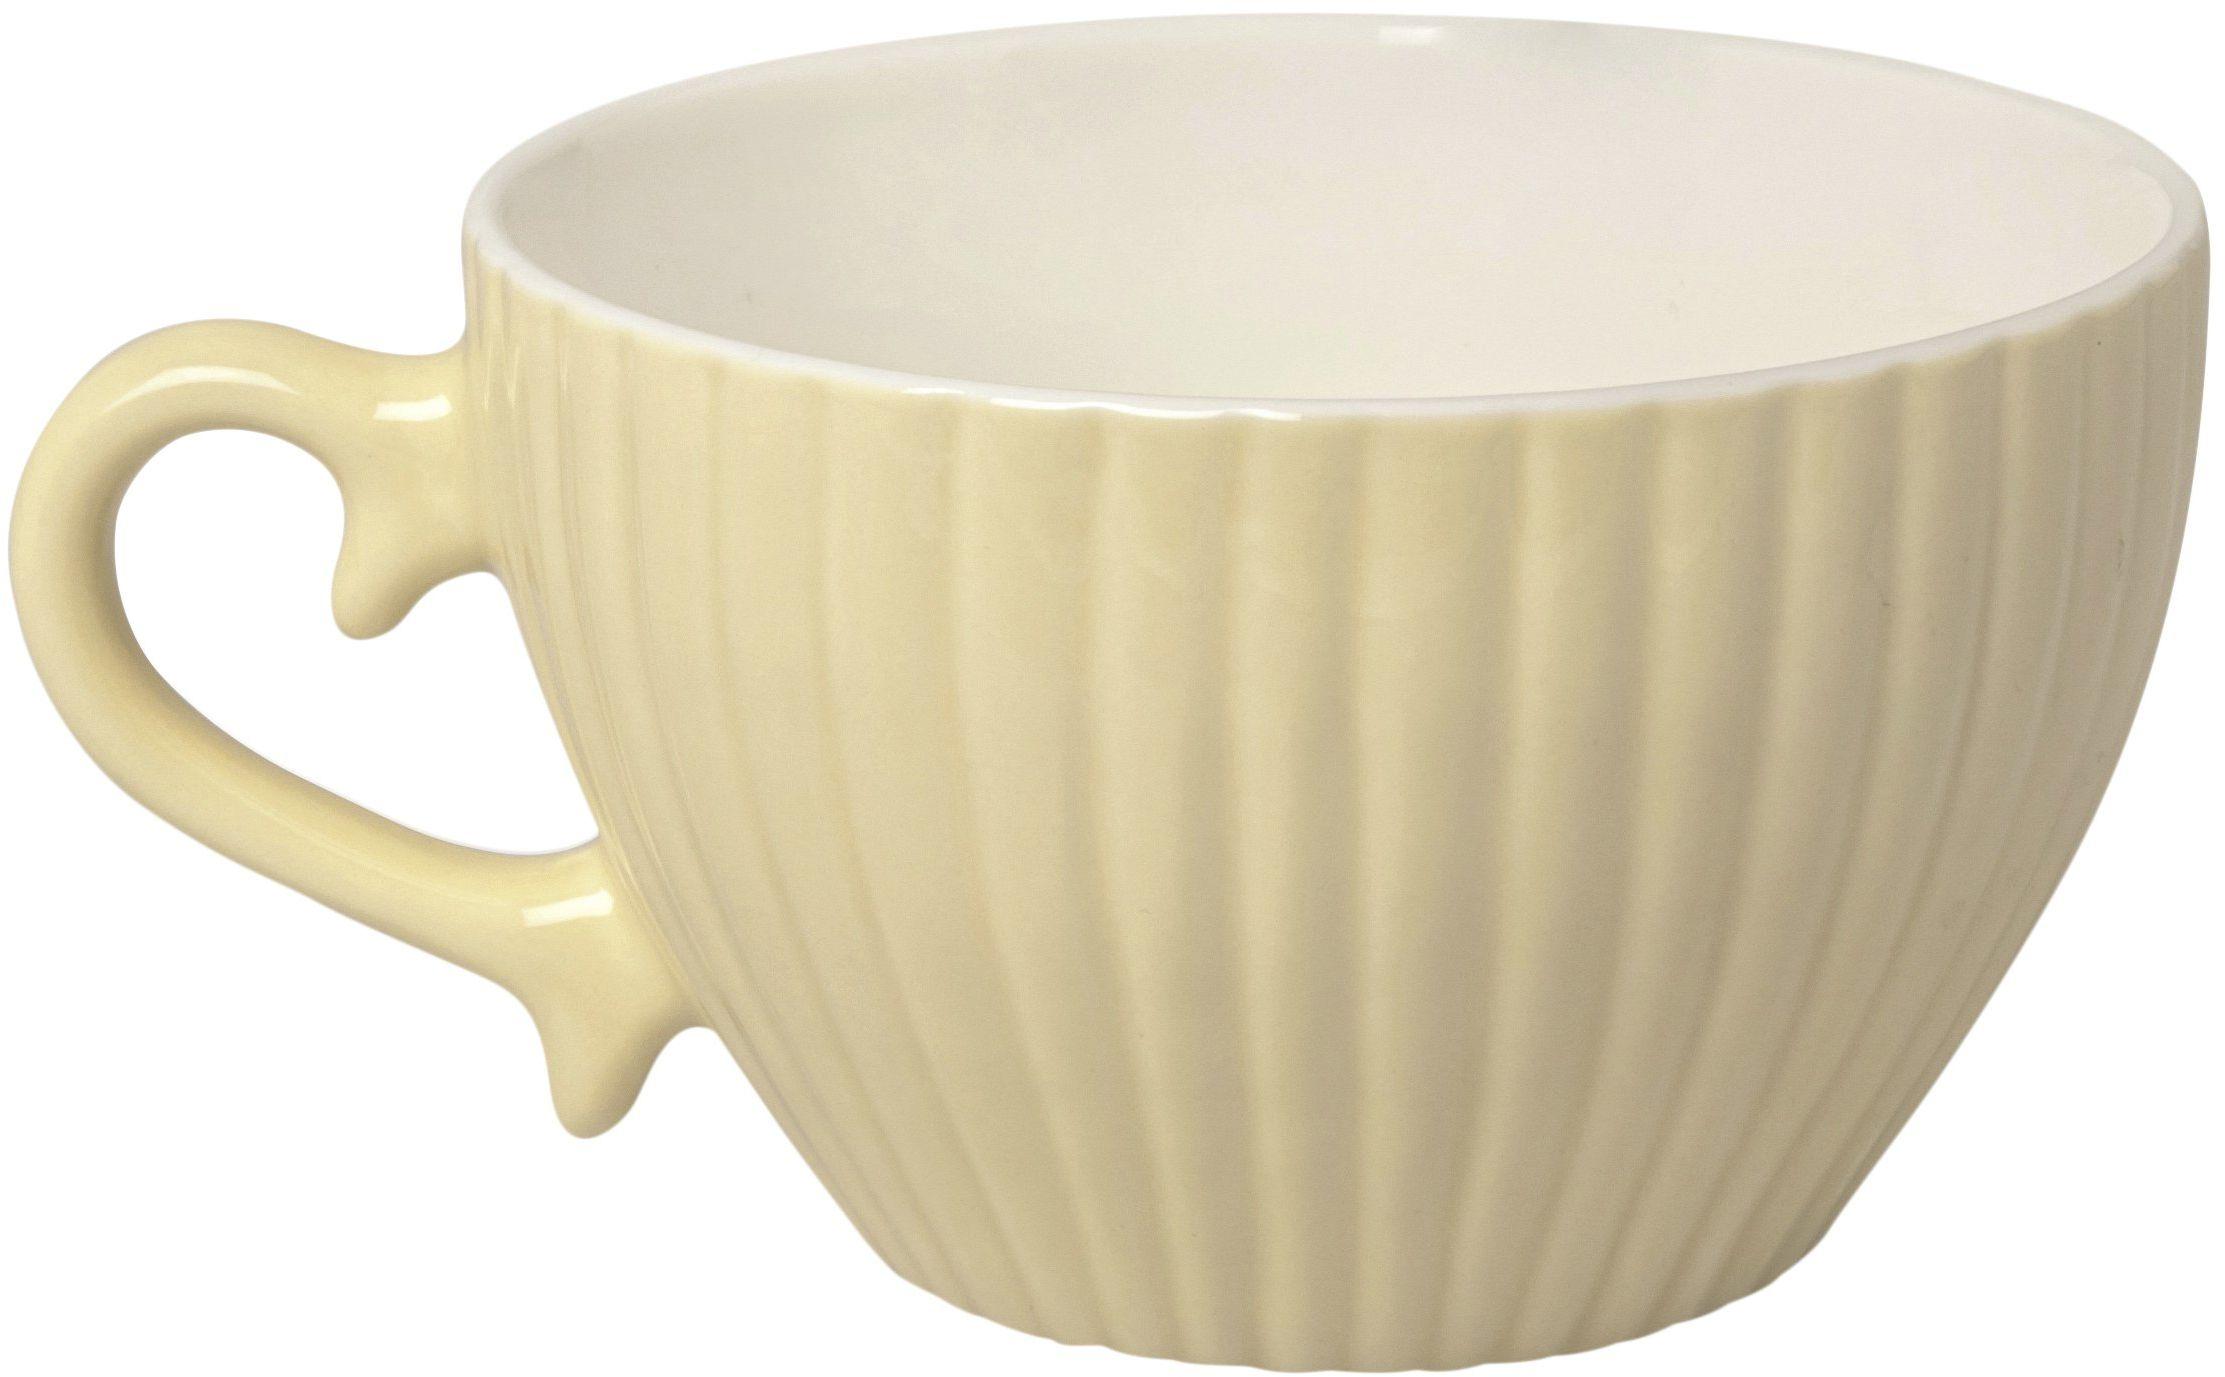 Excelsa Parisienne filiżanka Jumbo 400 ml, porcelana, kremowa, 11,5 x 11,5 x 7,2 cm